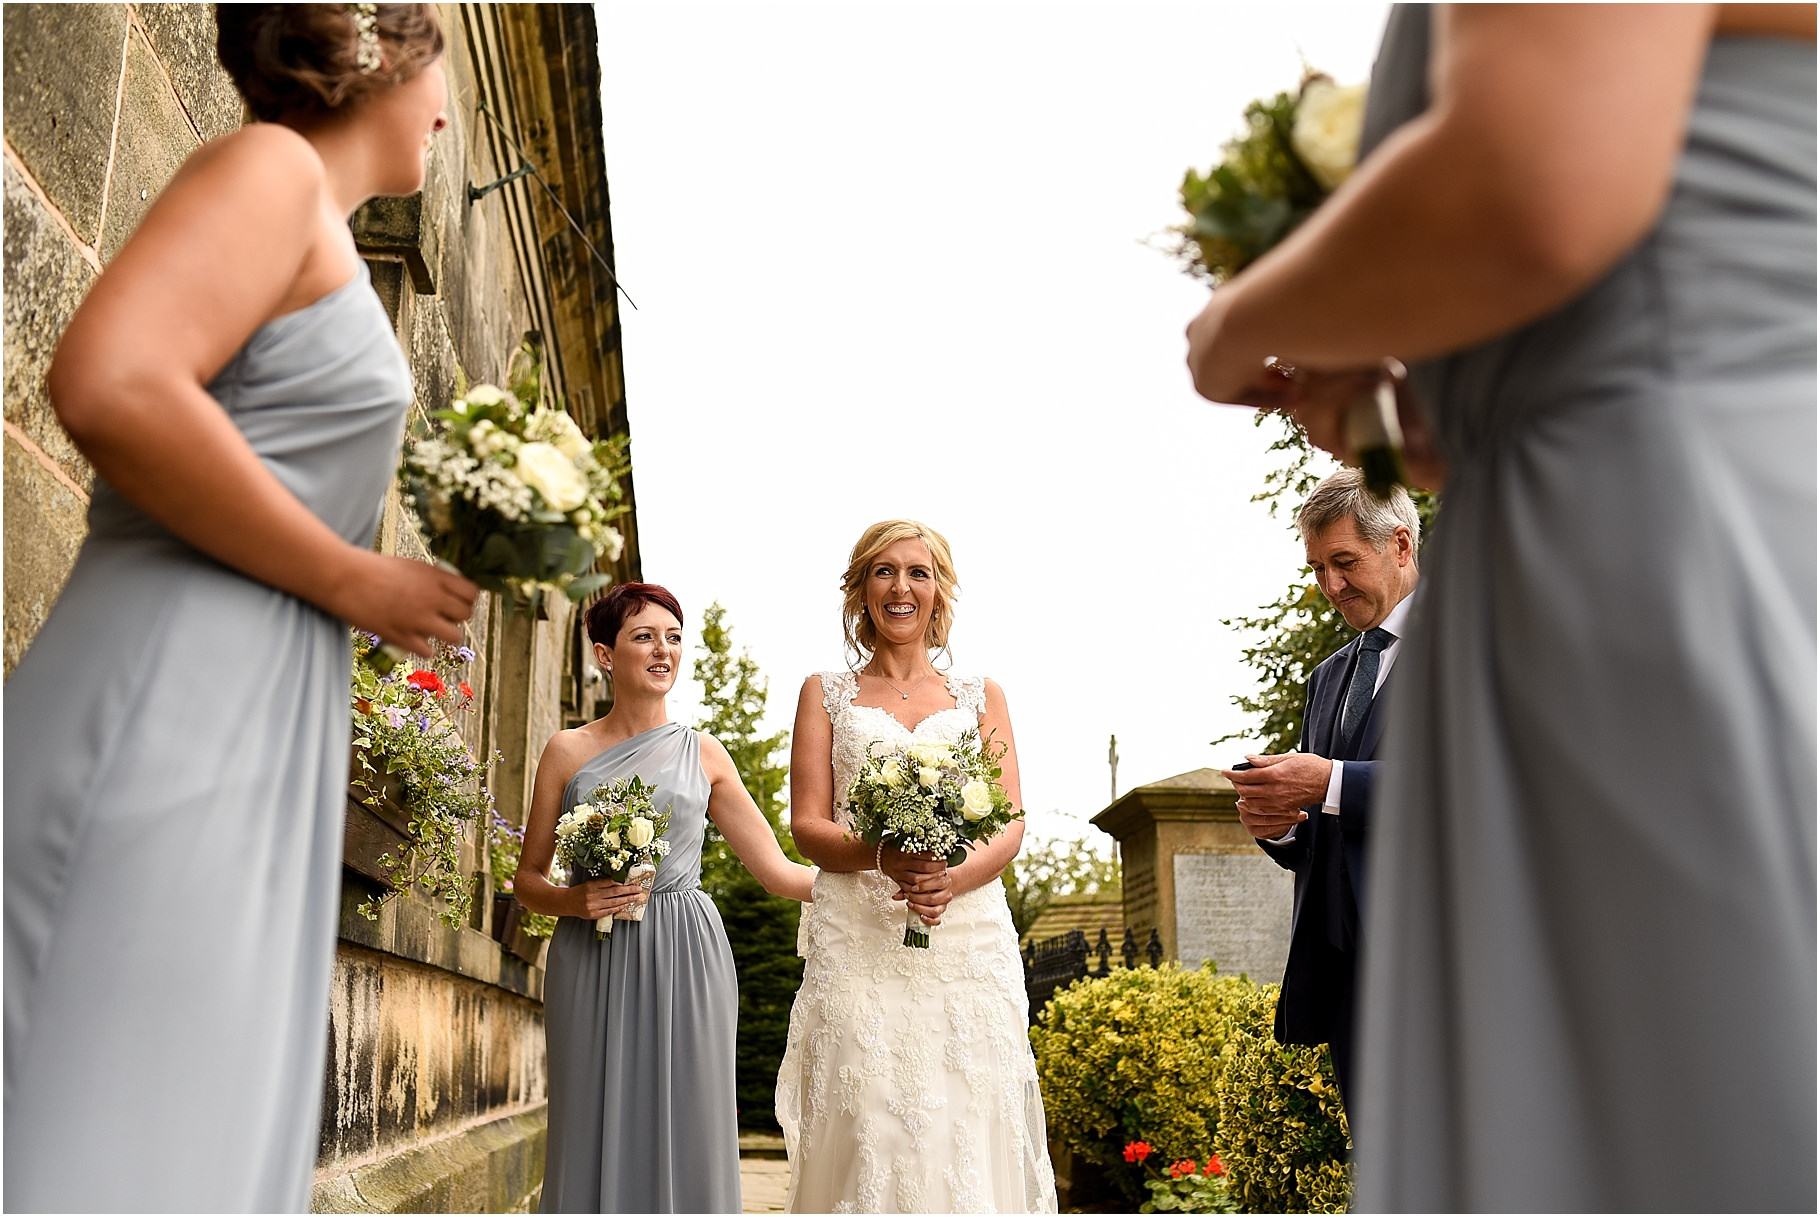 bartle-hall-wedding-photography-032.jpg